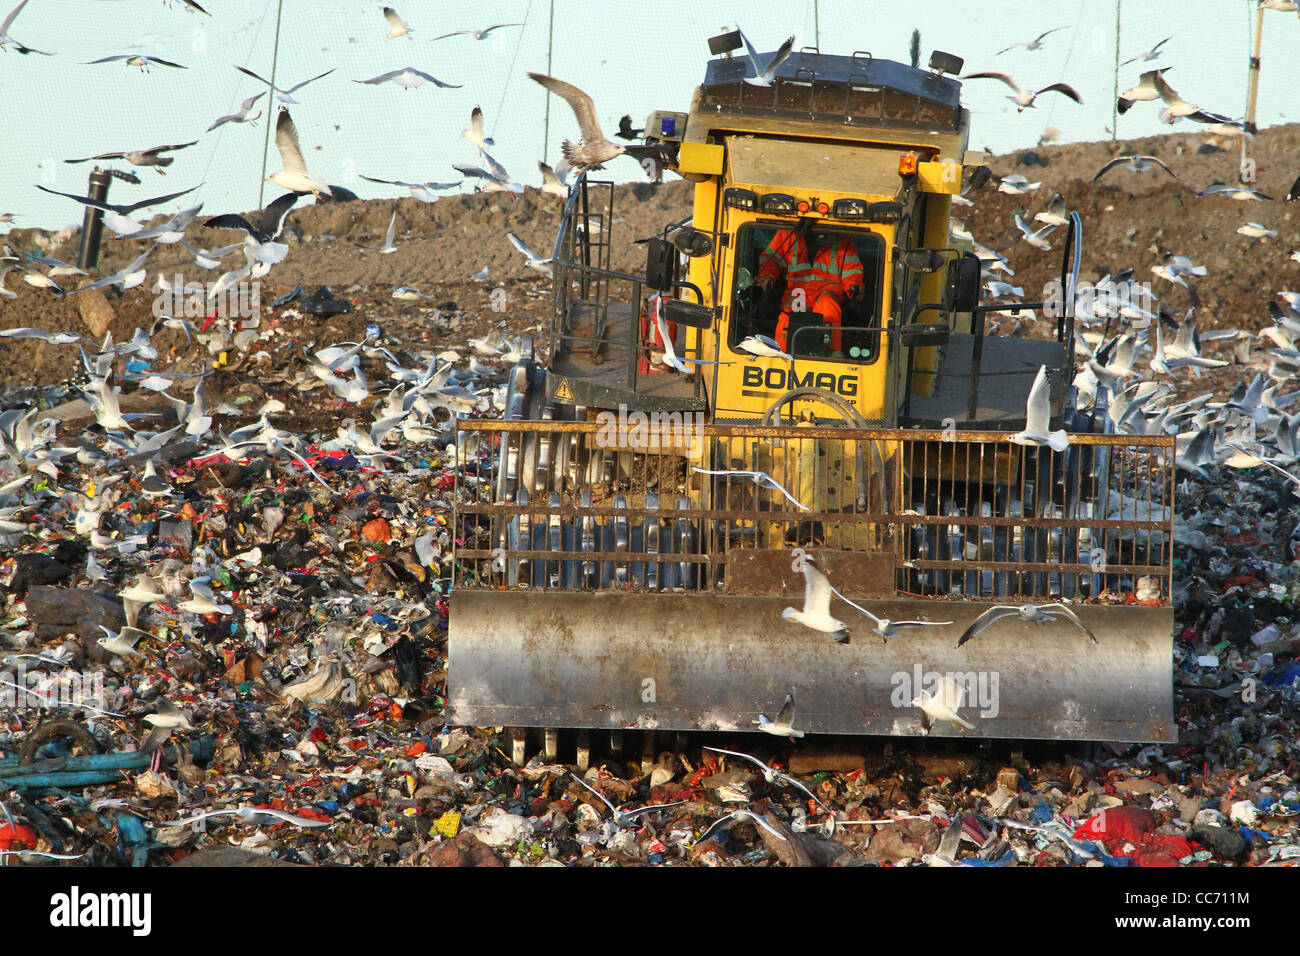 A landfill site in Huntingdon, Cambridgeshire - Stock Image